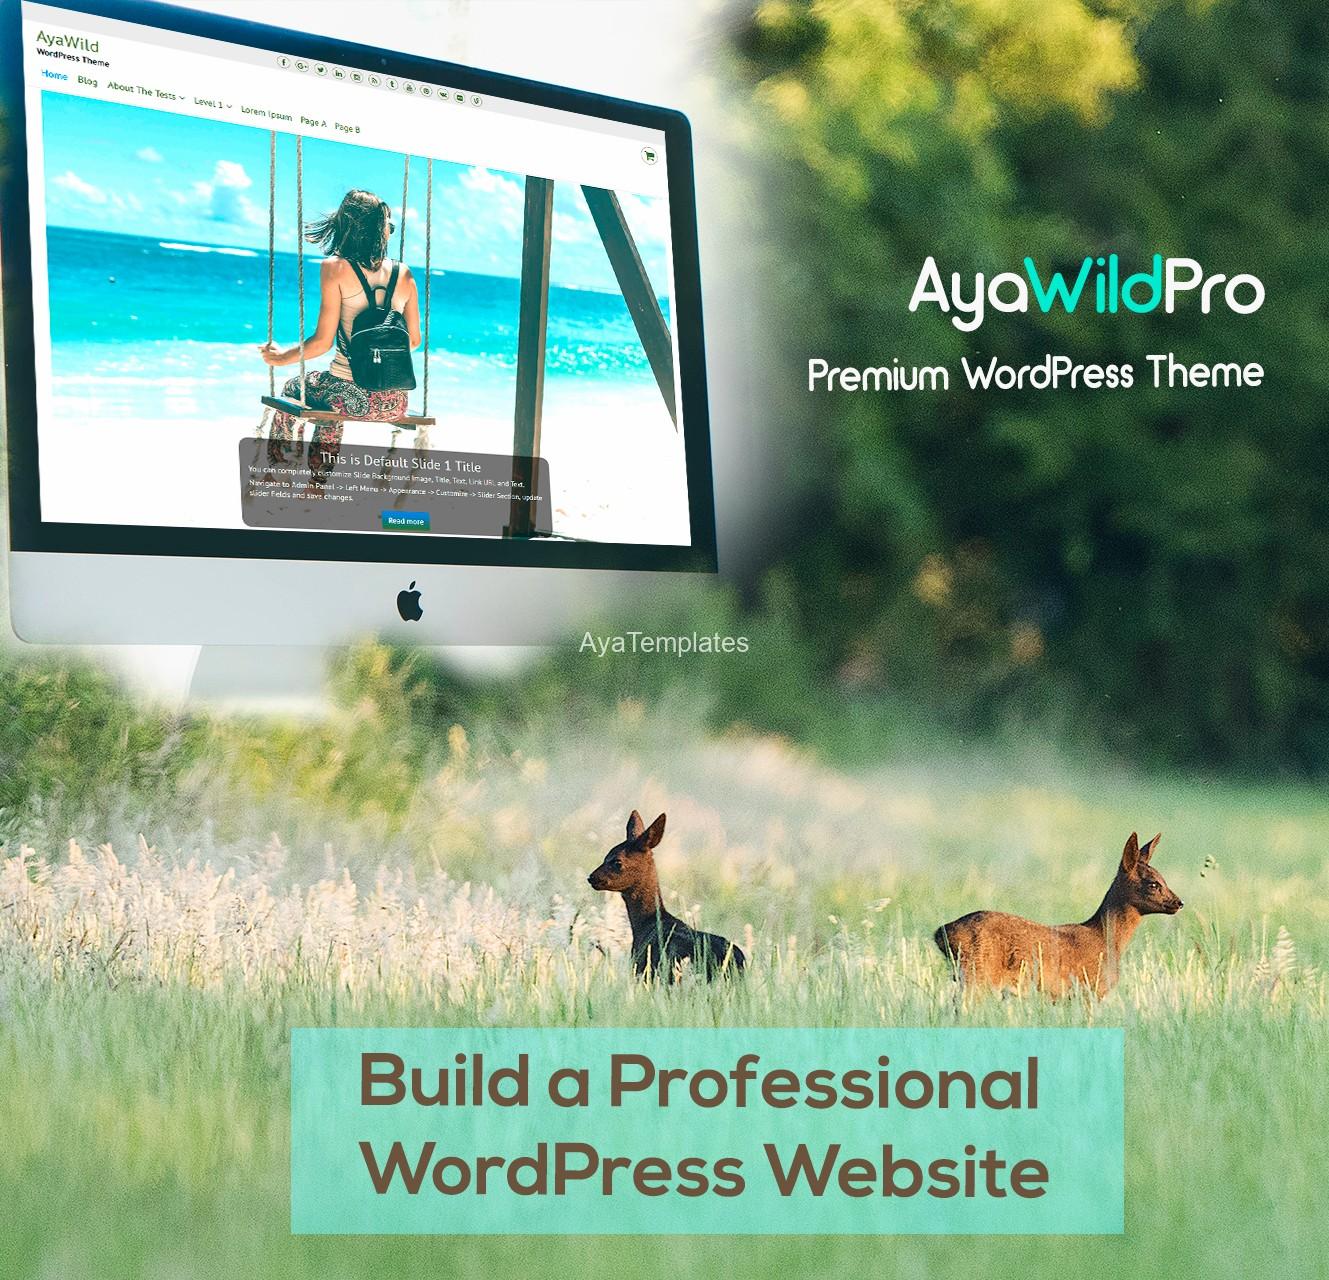 AyaWildPro-premium-wordpress-theme-mockup